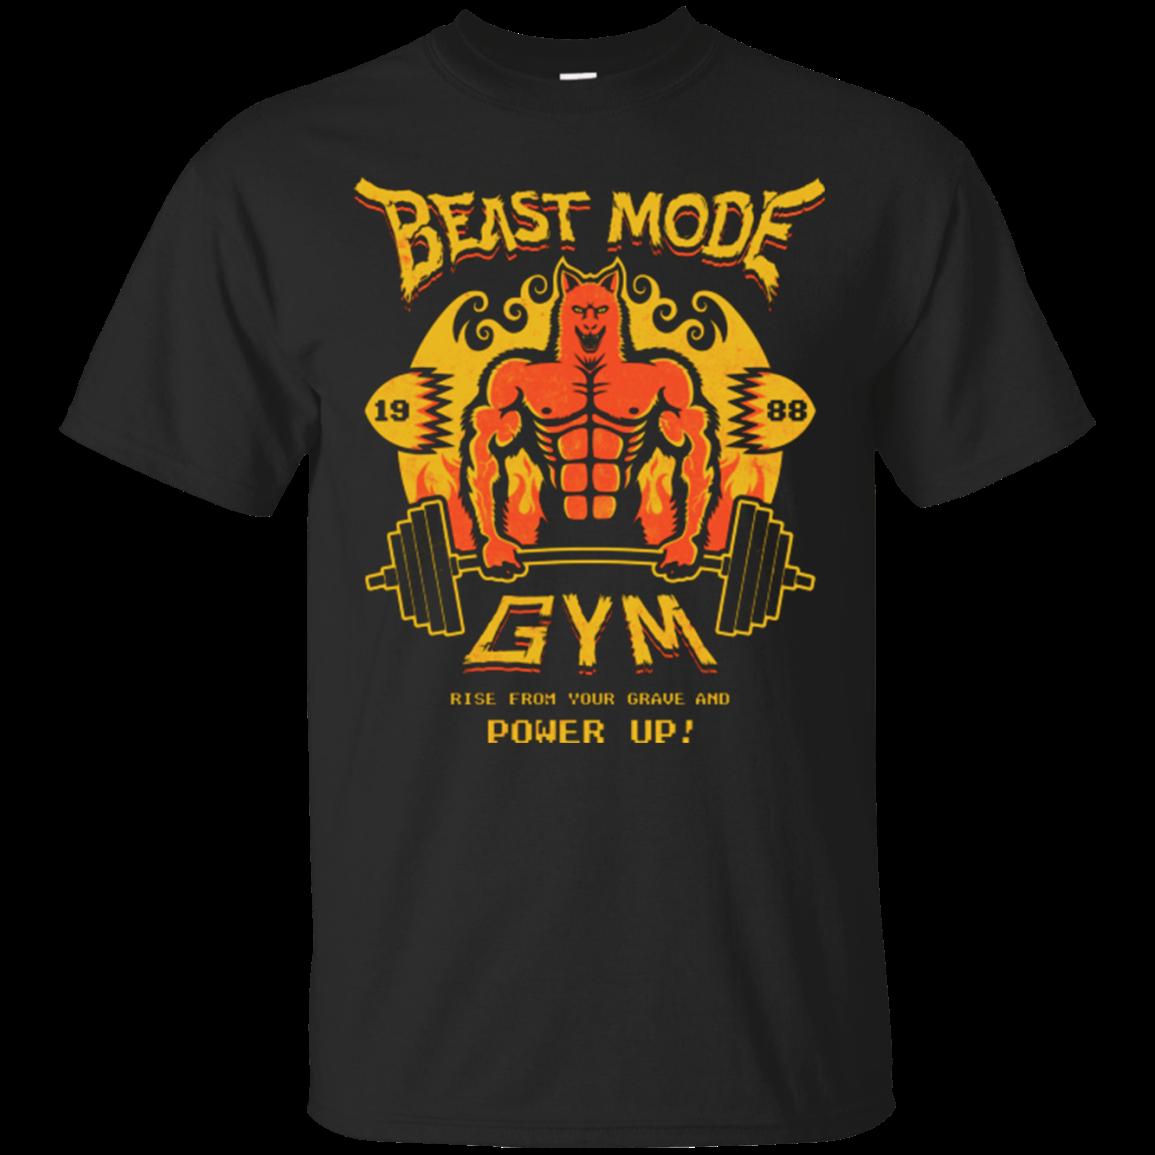 Camiseta estampada de algodón para hombre, camiseta de manga corta con cuello redondo para gimnasio